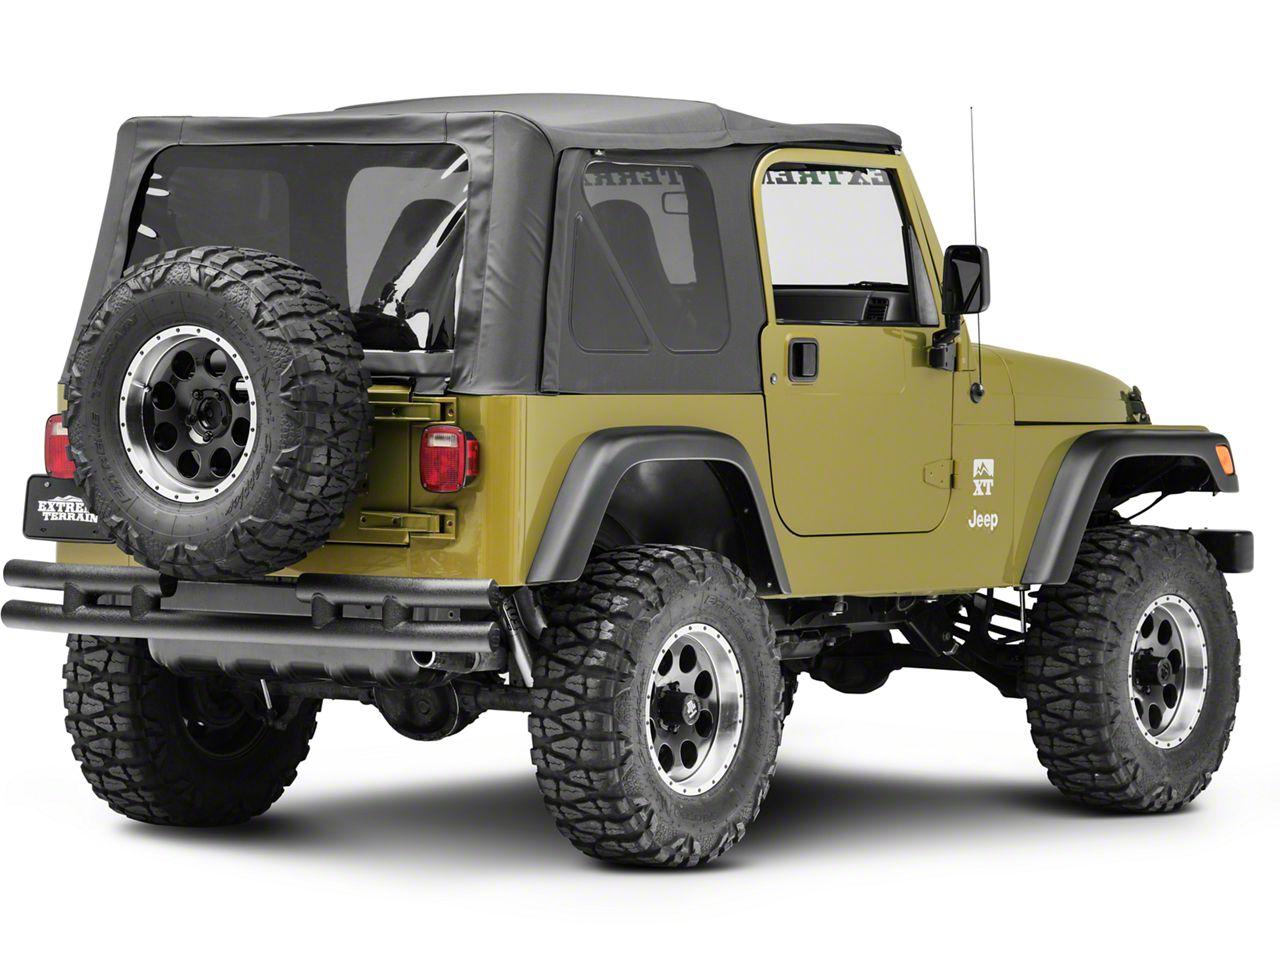 Smittybilt Rear Tubular Bumper - Textured Black (87-06 Jeep Wrangler YJ & TJ)